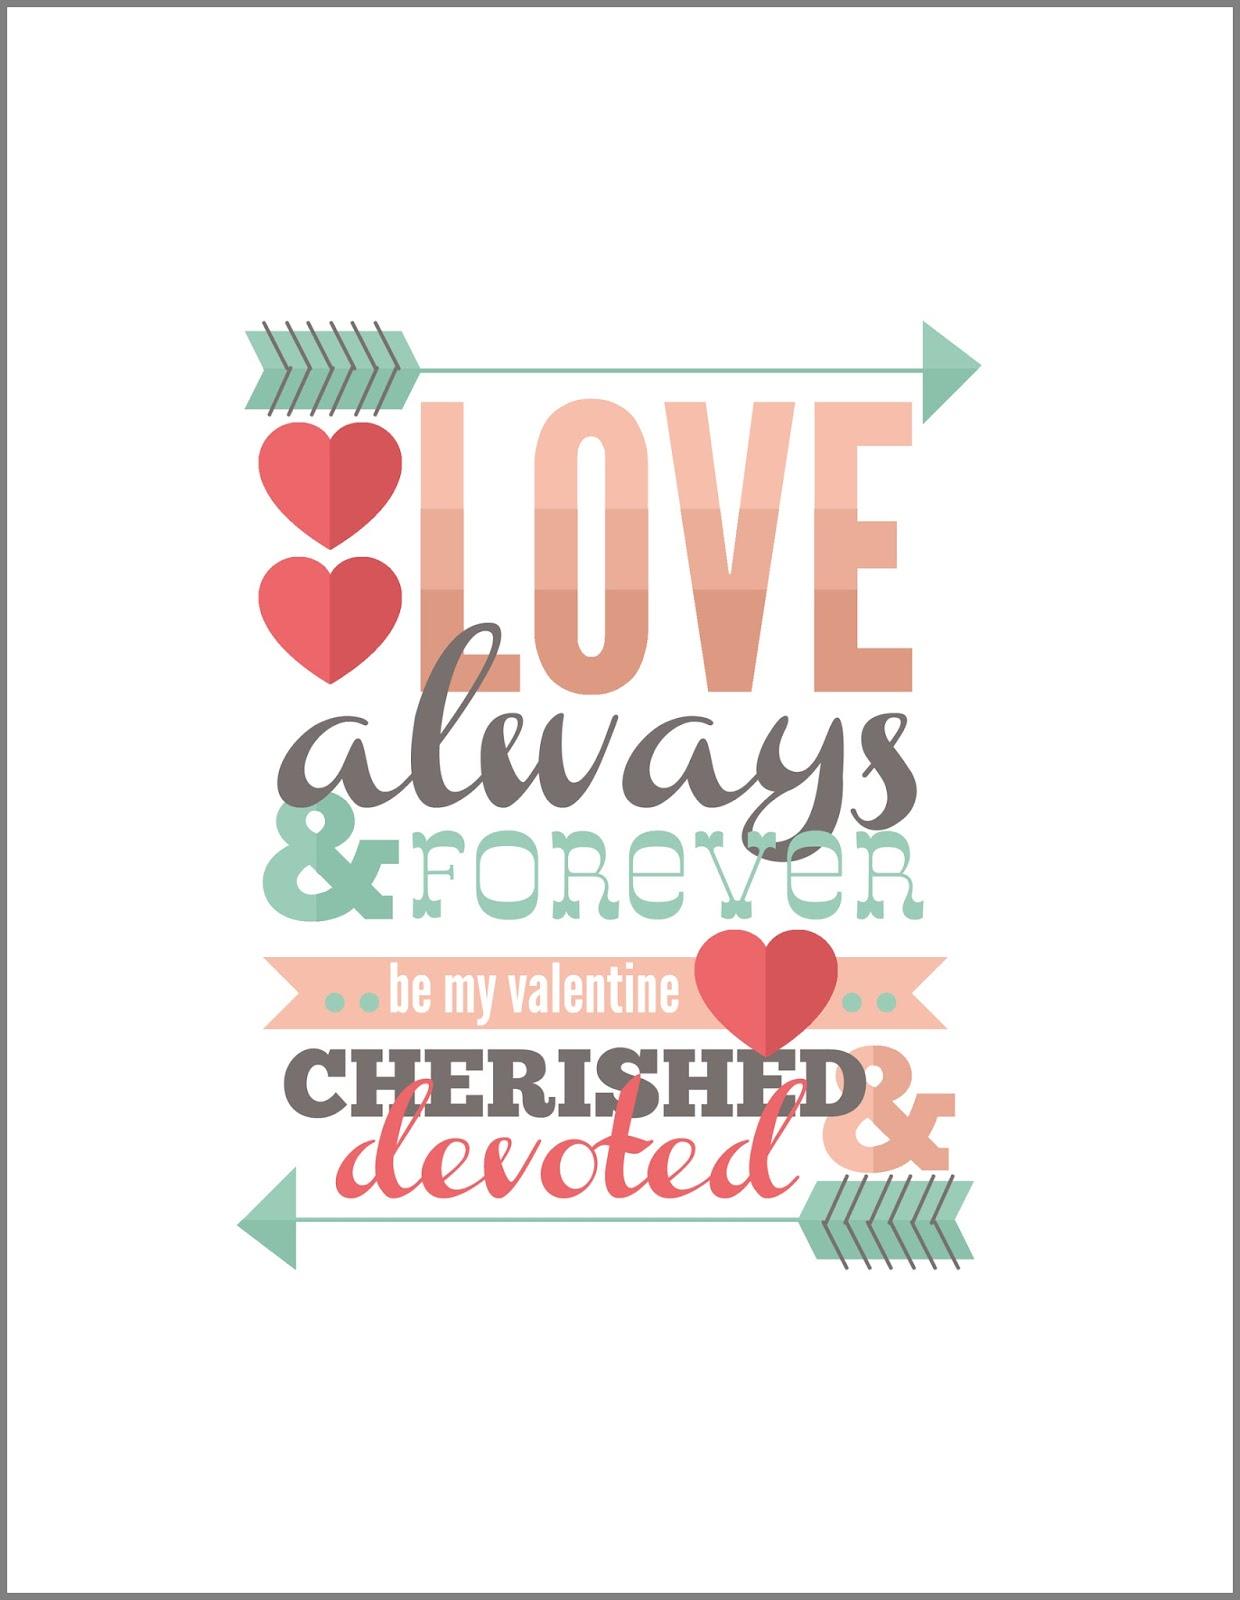 http://3.bp.blogspot.com/-0FZGMo-p_ok/VJLXoE-zt0I/AAAAAAAATqI/rHJVyF0DTpI/s1600/Love-Always-Printable-image.jpg